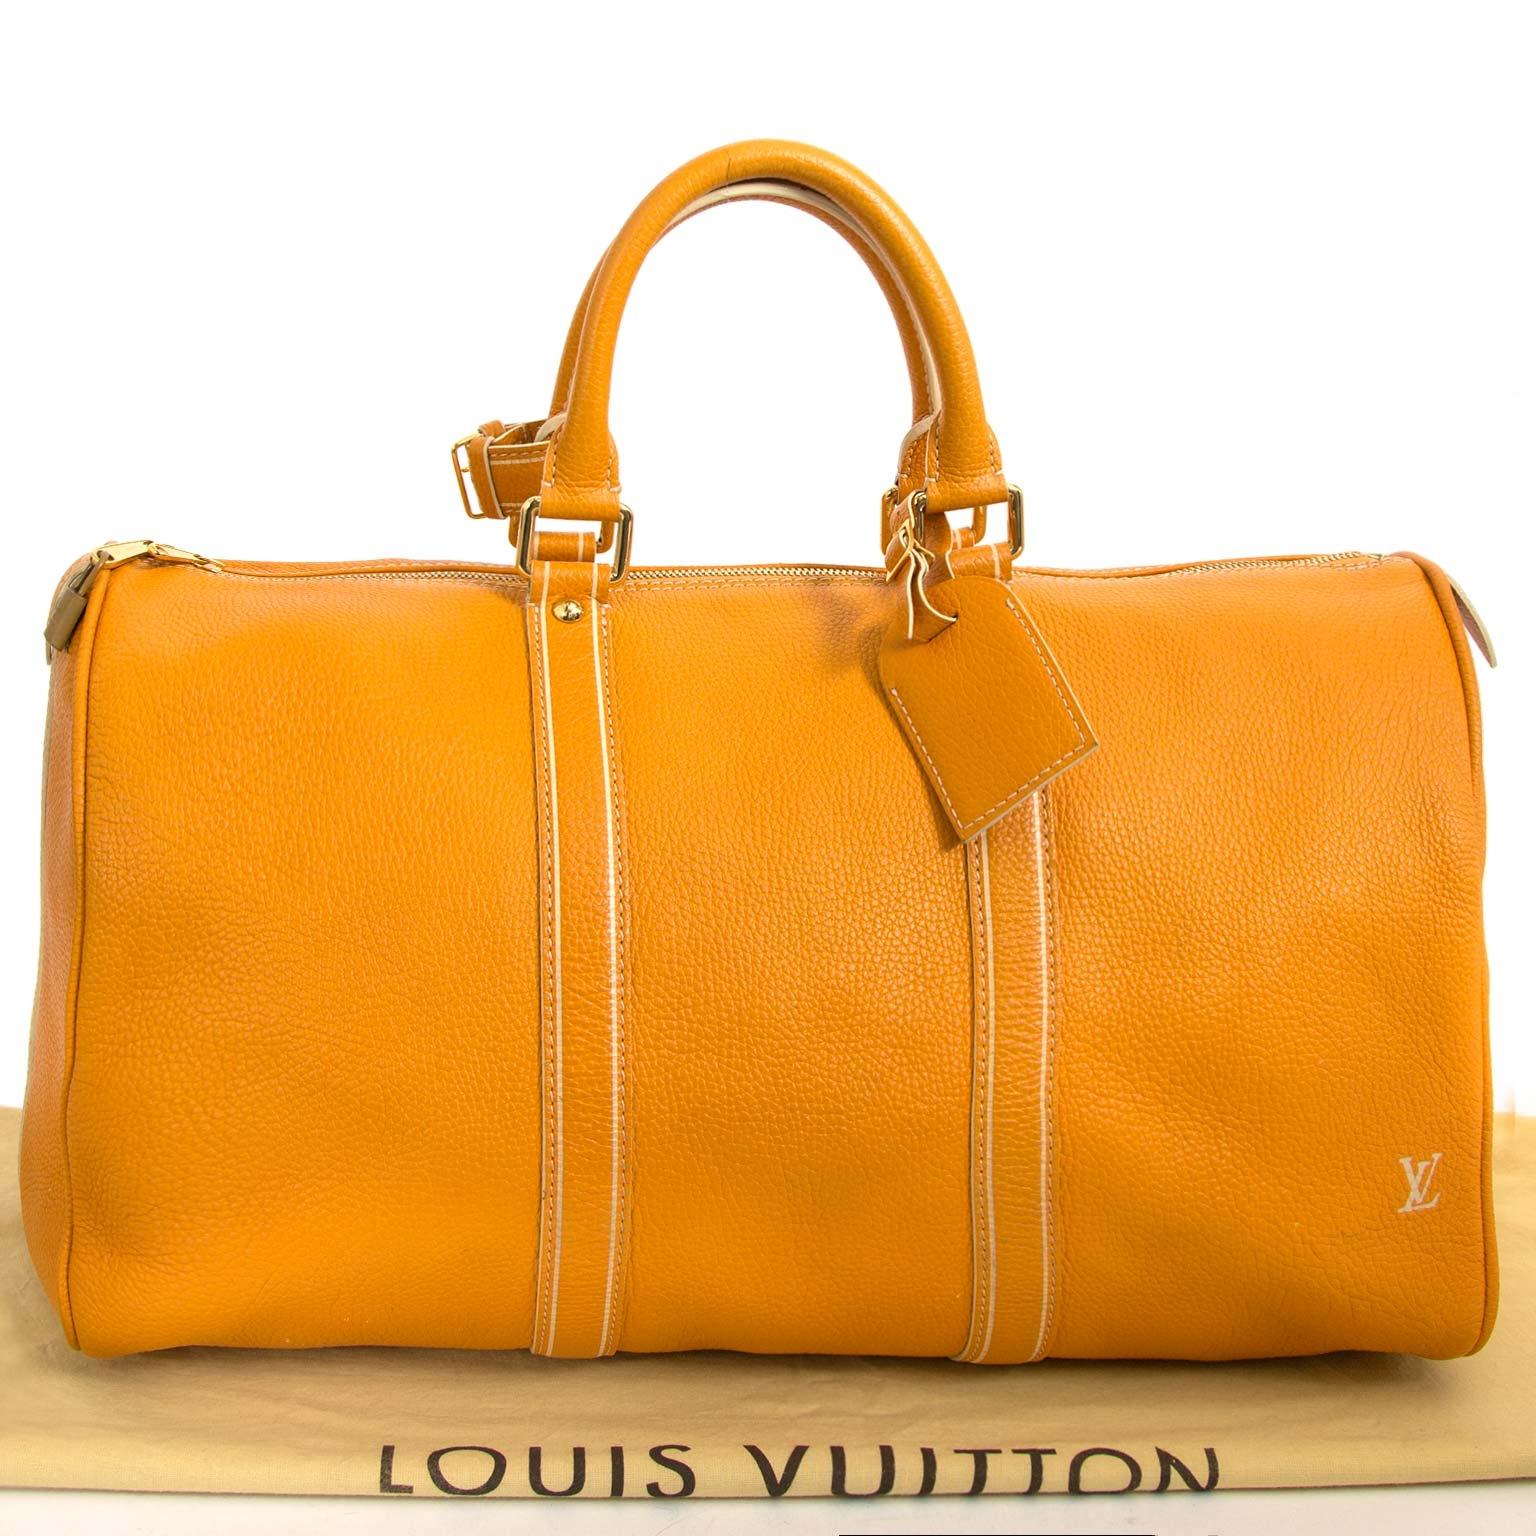 acheter en ligne seconde main Louis Vuitton Keepall Tobago Yellow Runway Travel Bag